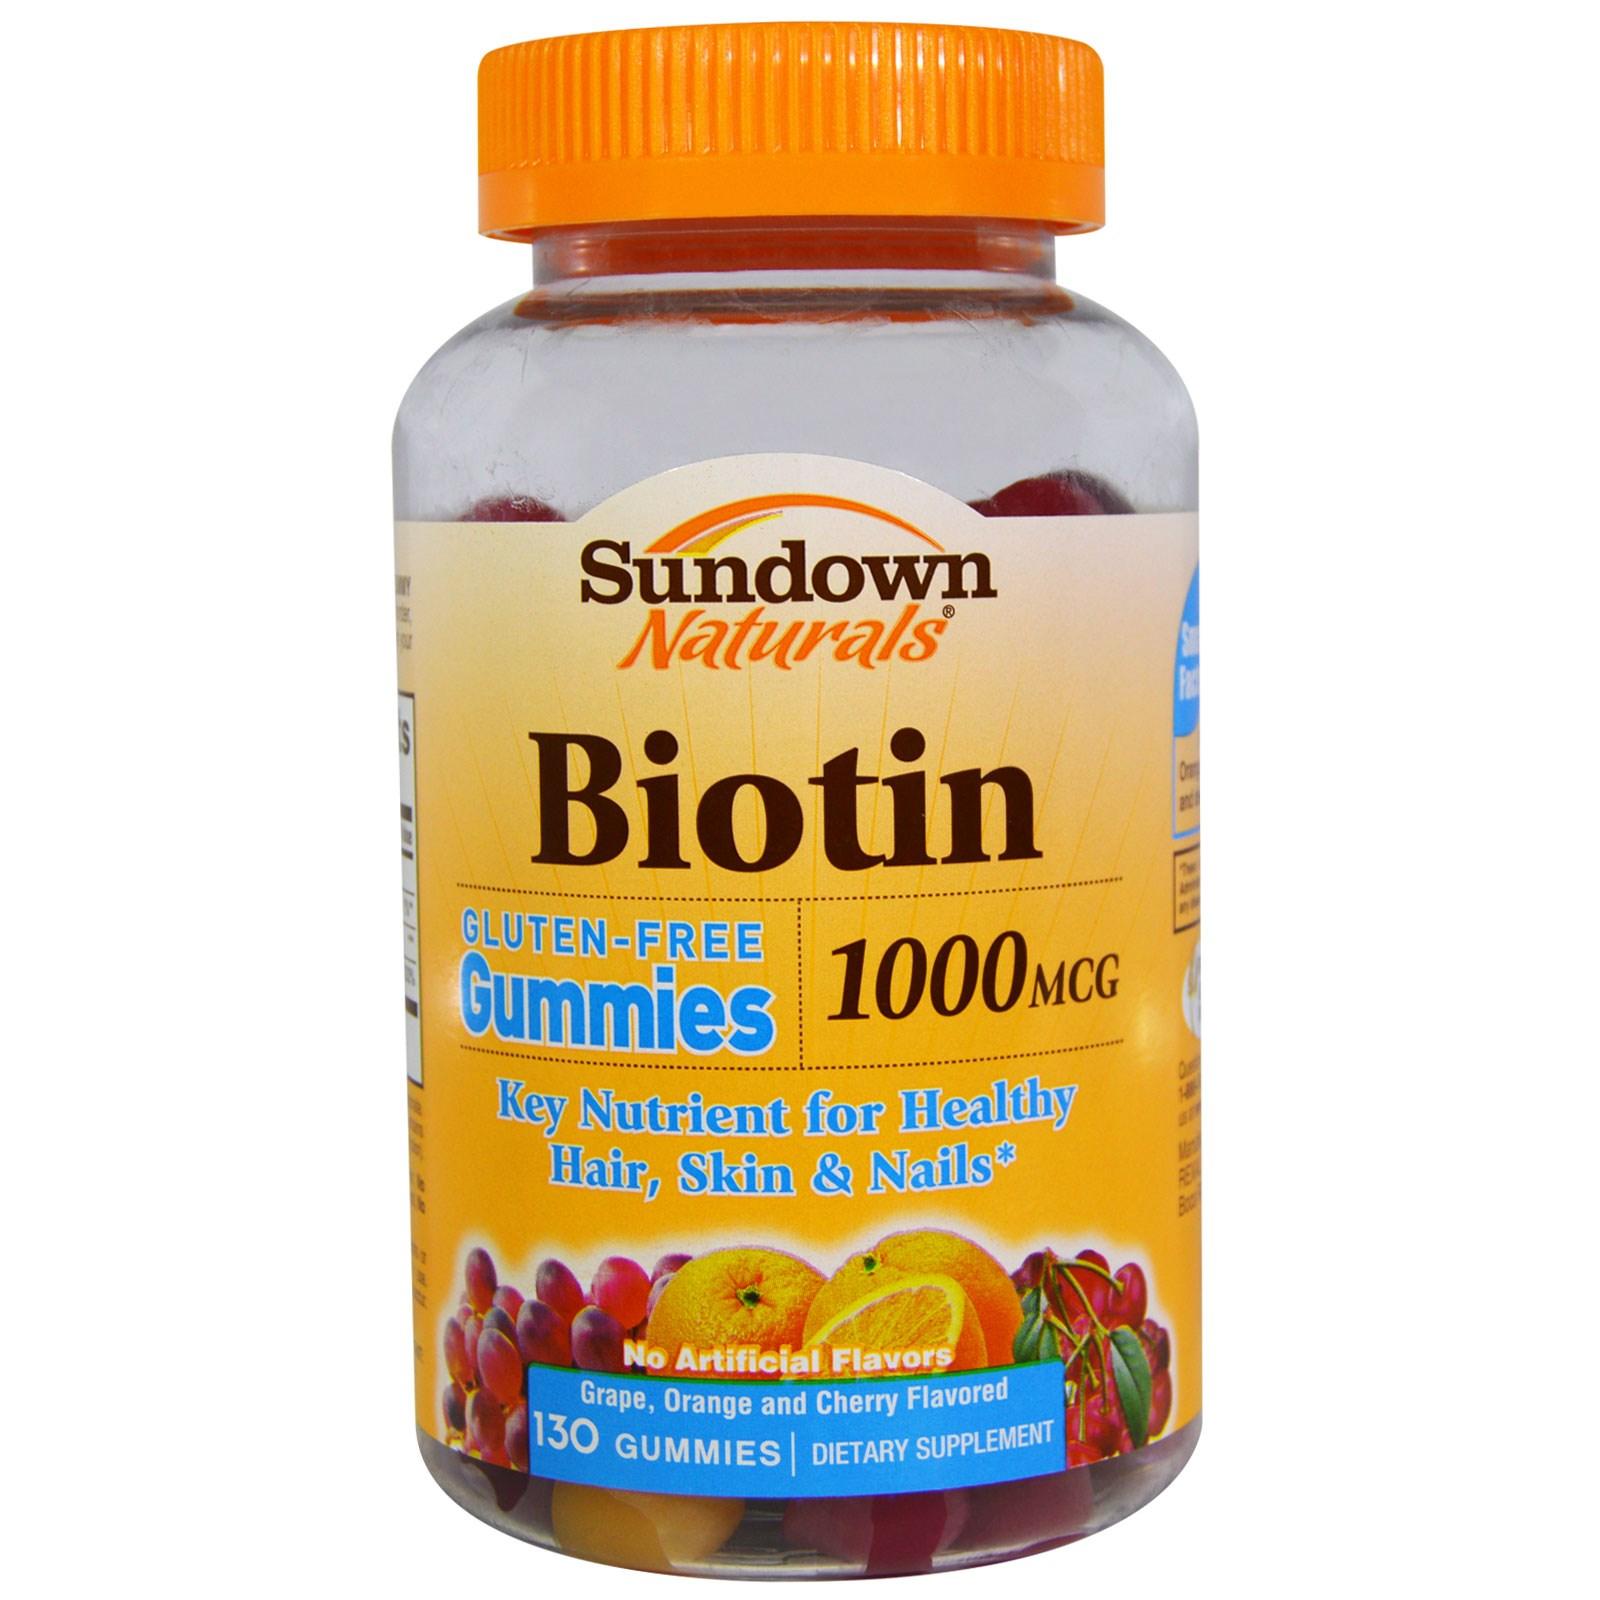 Sundown Naturals, Биотин, со вкусом винограда, апельсина и вишни, 1000 мкг, 130 желатиновых конфет